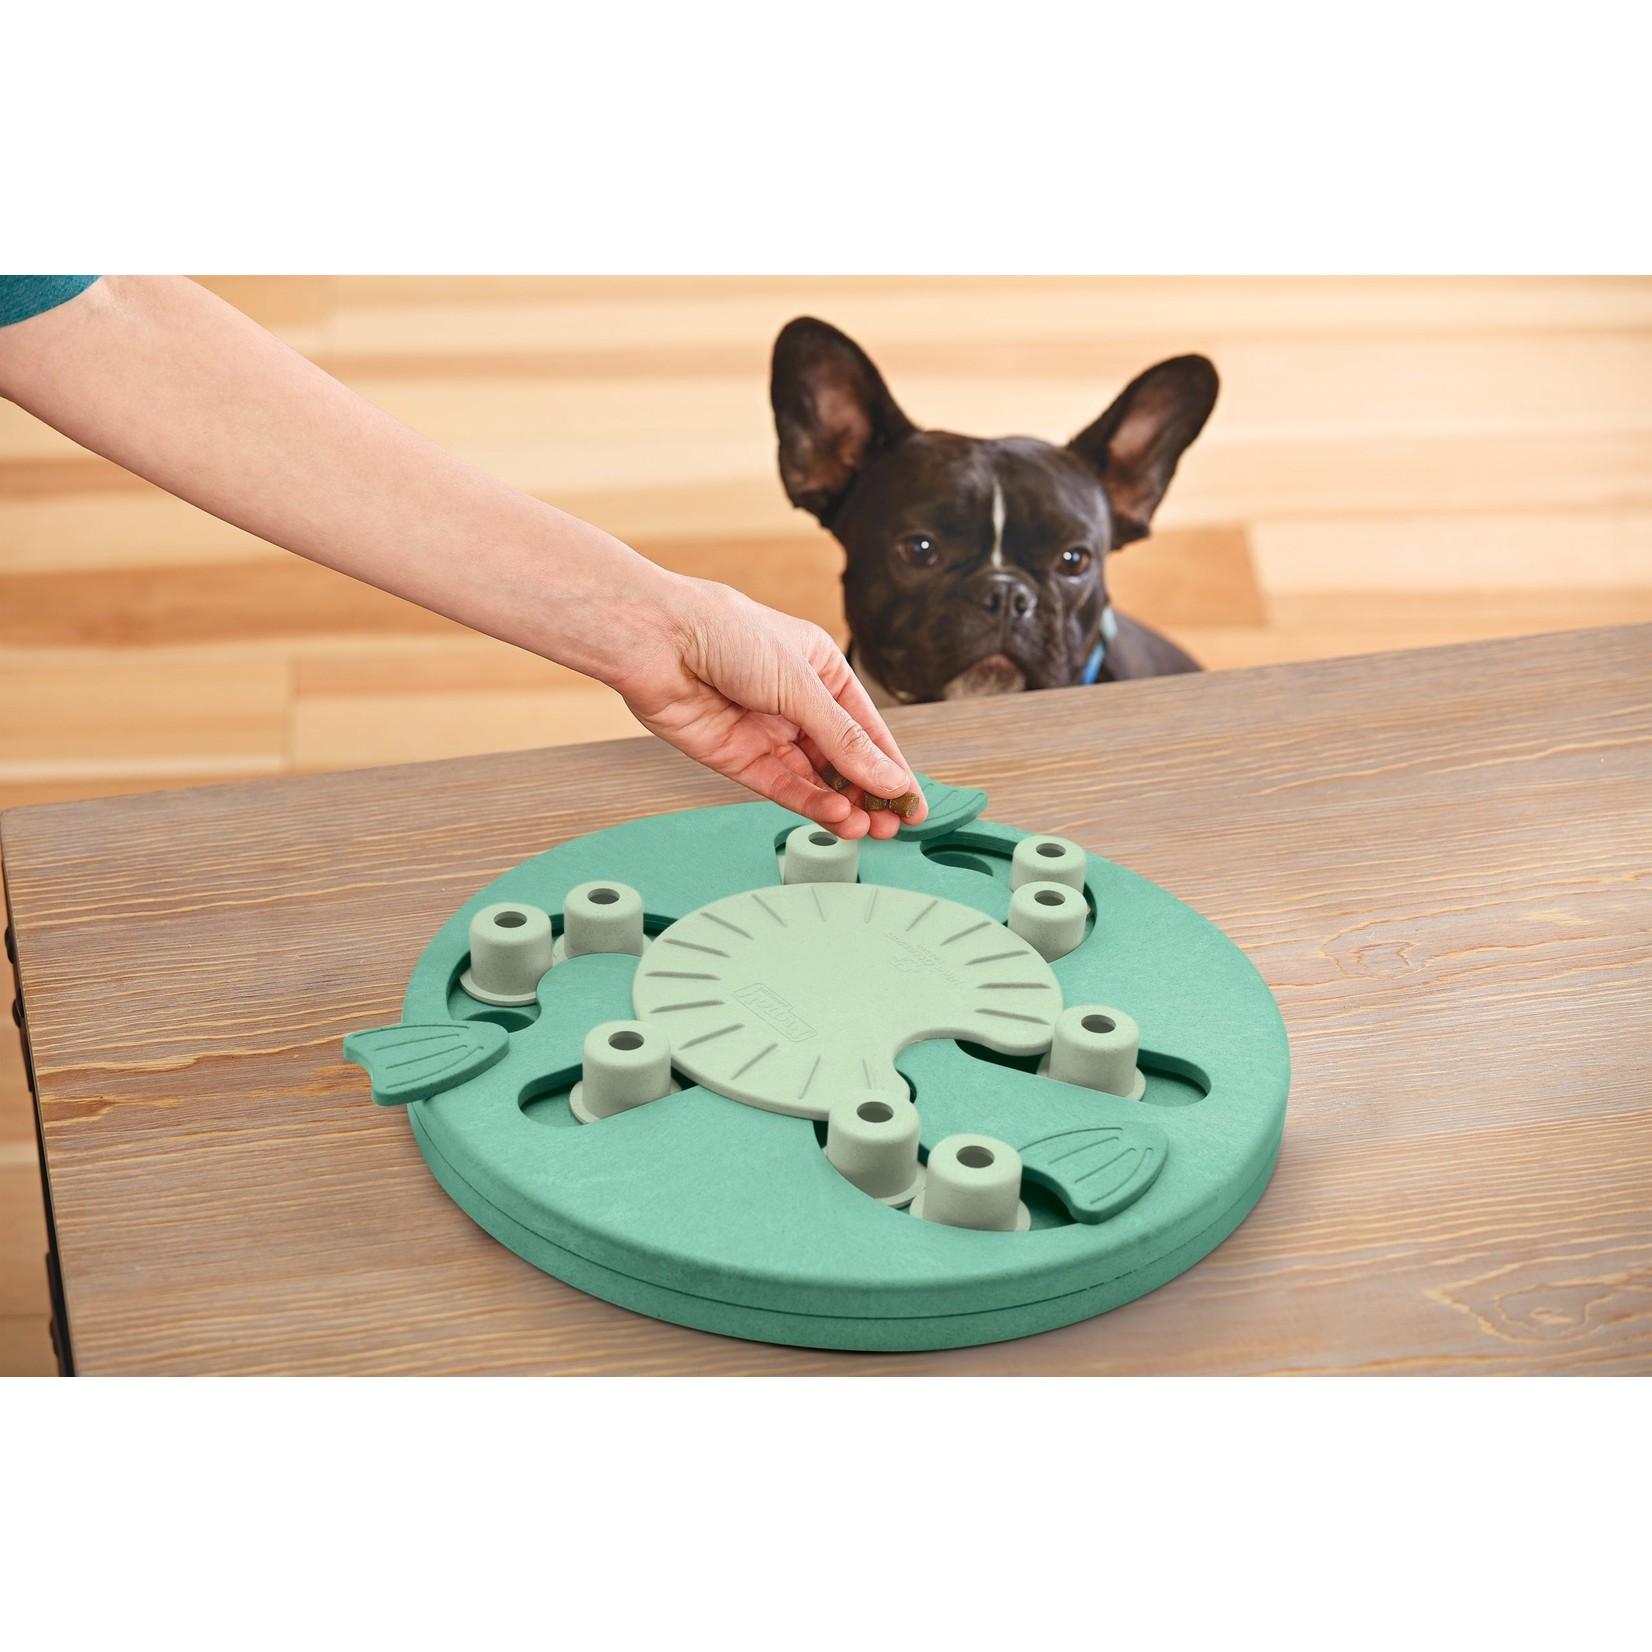 Intelligentiespel Dog Worker by Nina Ottoson